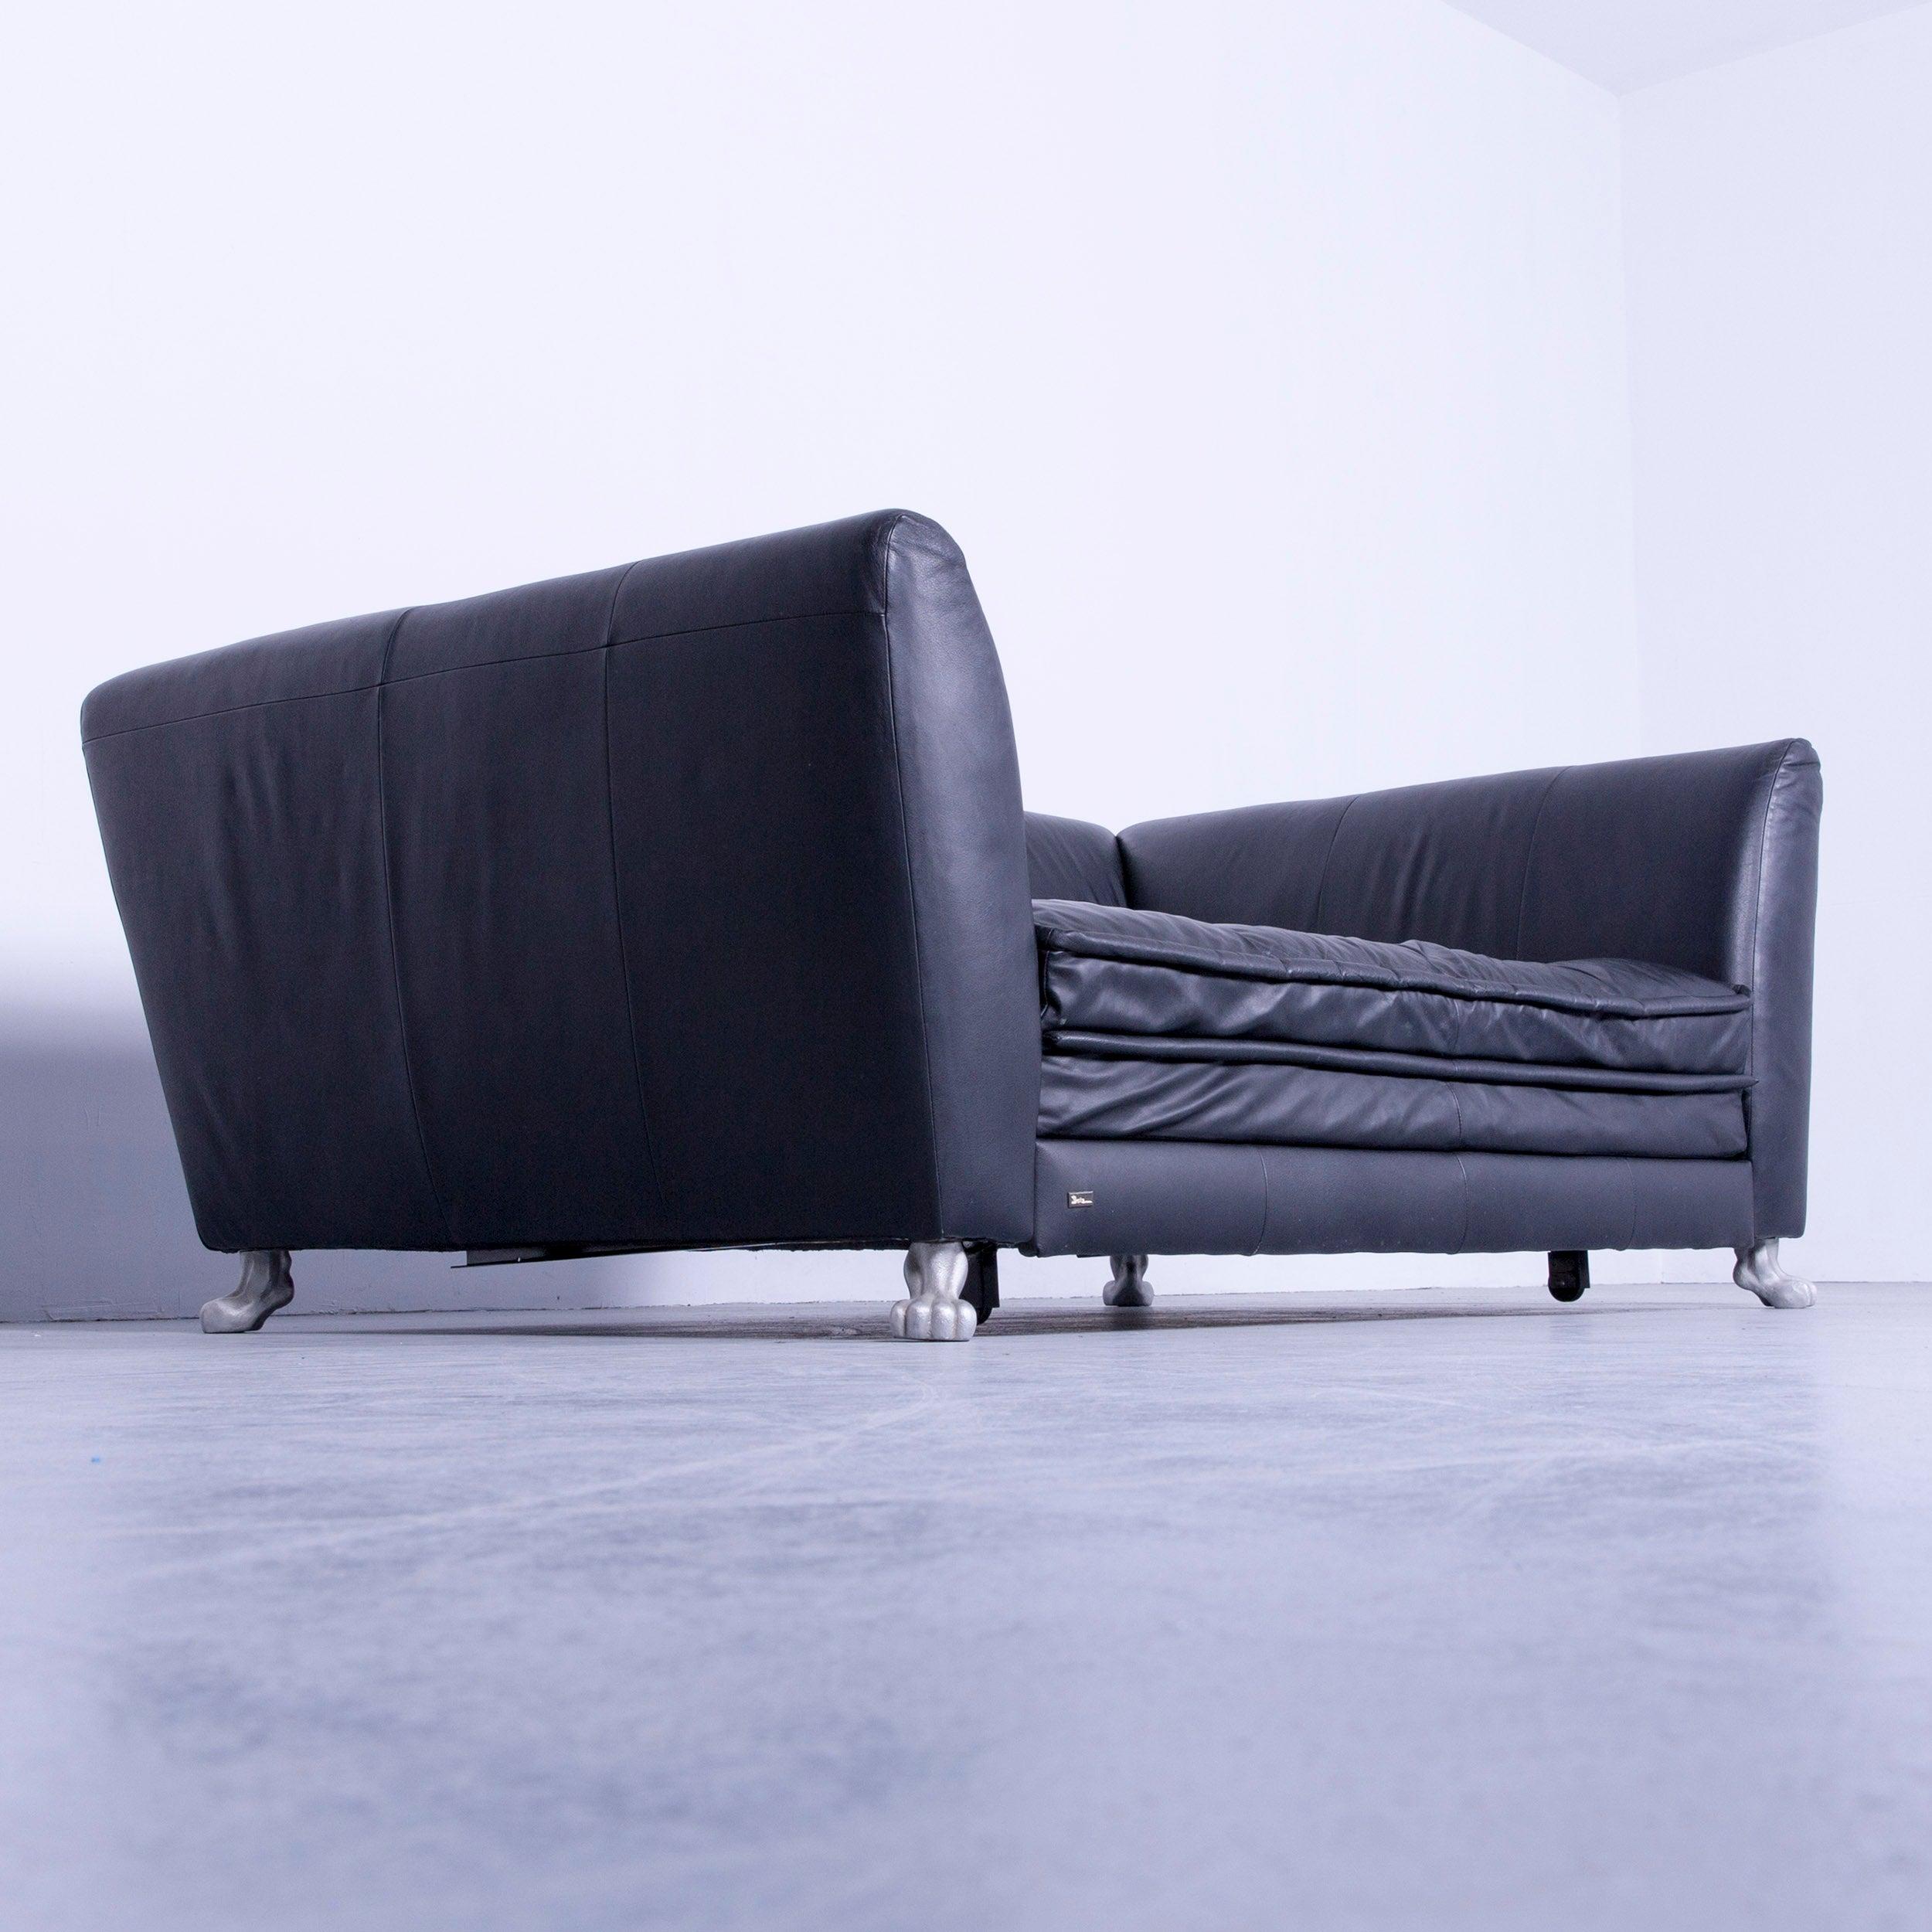 Bretz Monster Designer Sofa Black Leather Three-Seat Couch Sleeping ...